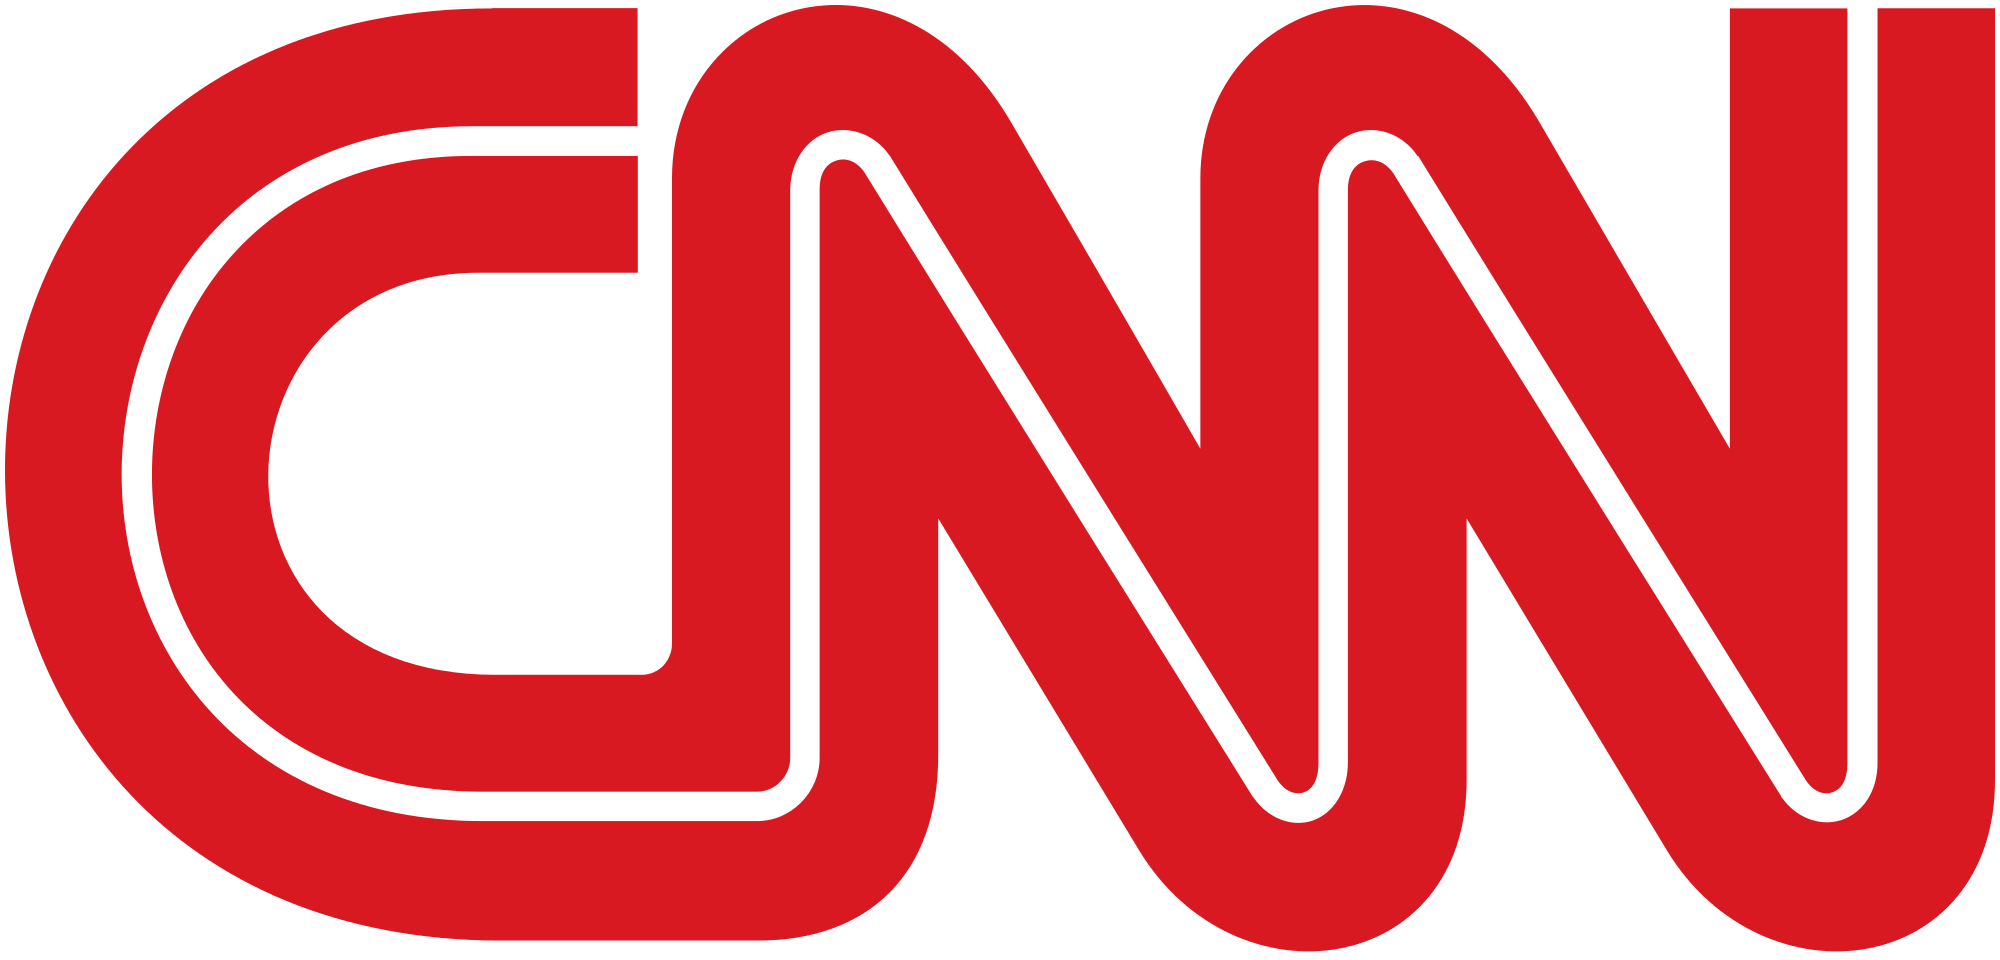 cnn logo red png #1802